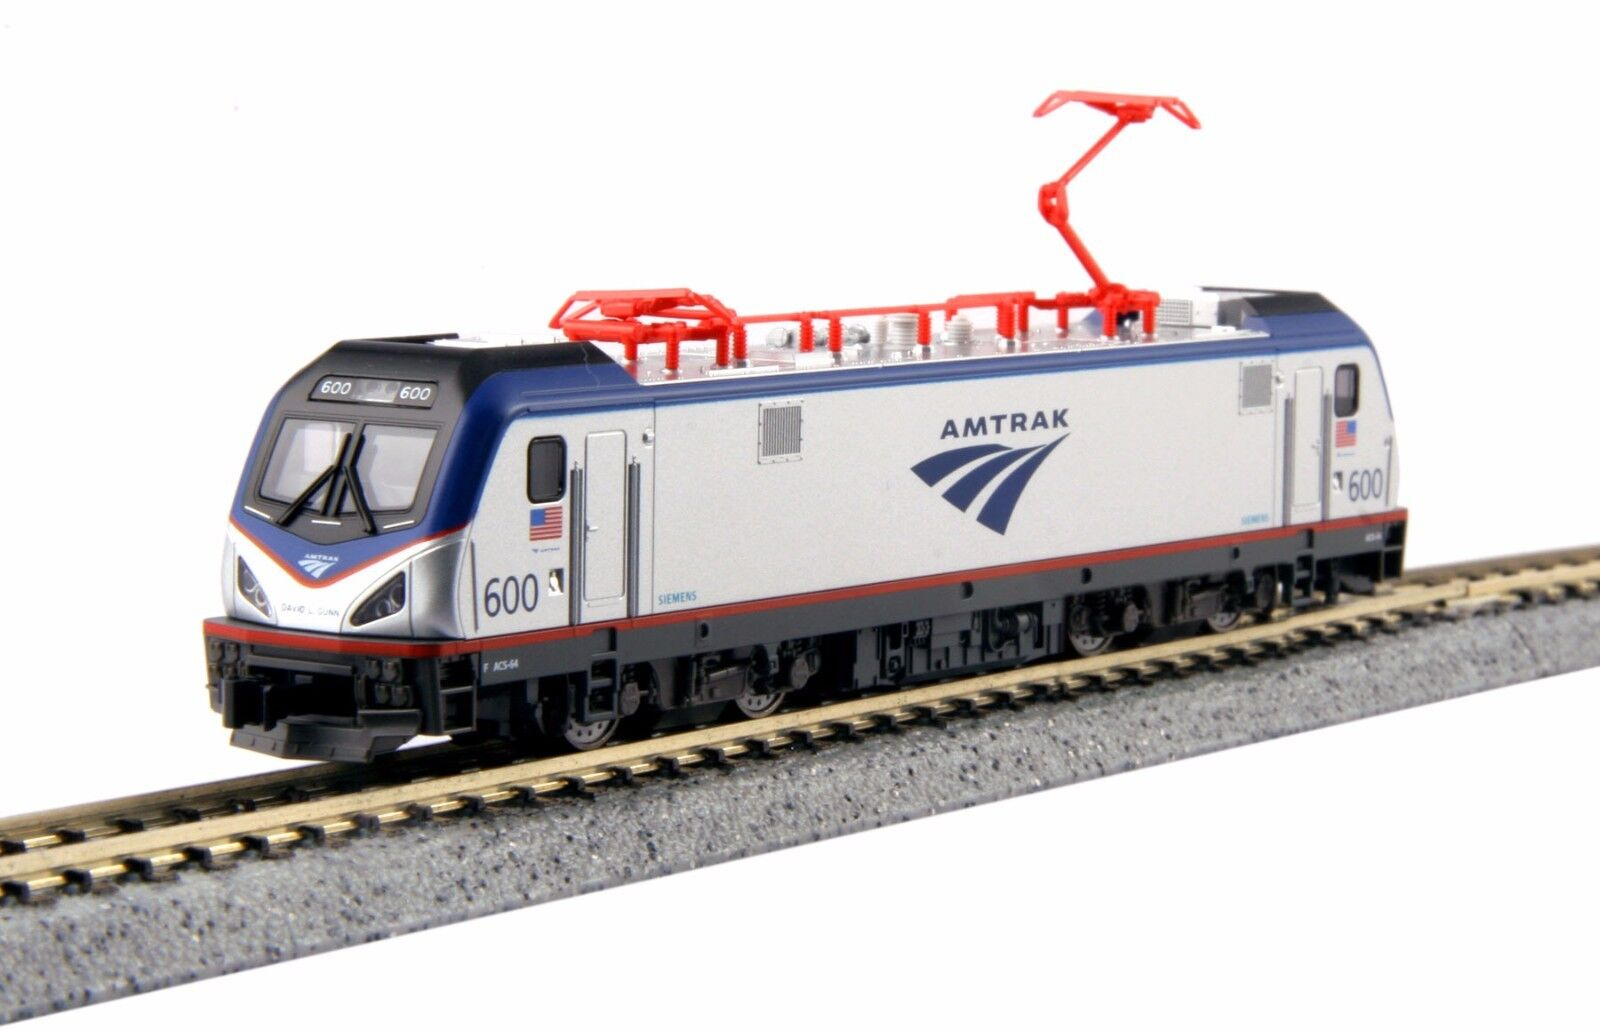 N Kato 3001 Siemens ACS-64 Amtrak Loco   600 David Gunn Nuevo en Caja Envío Gratuito